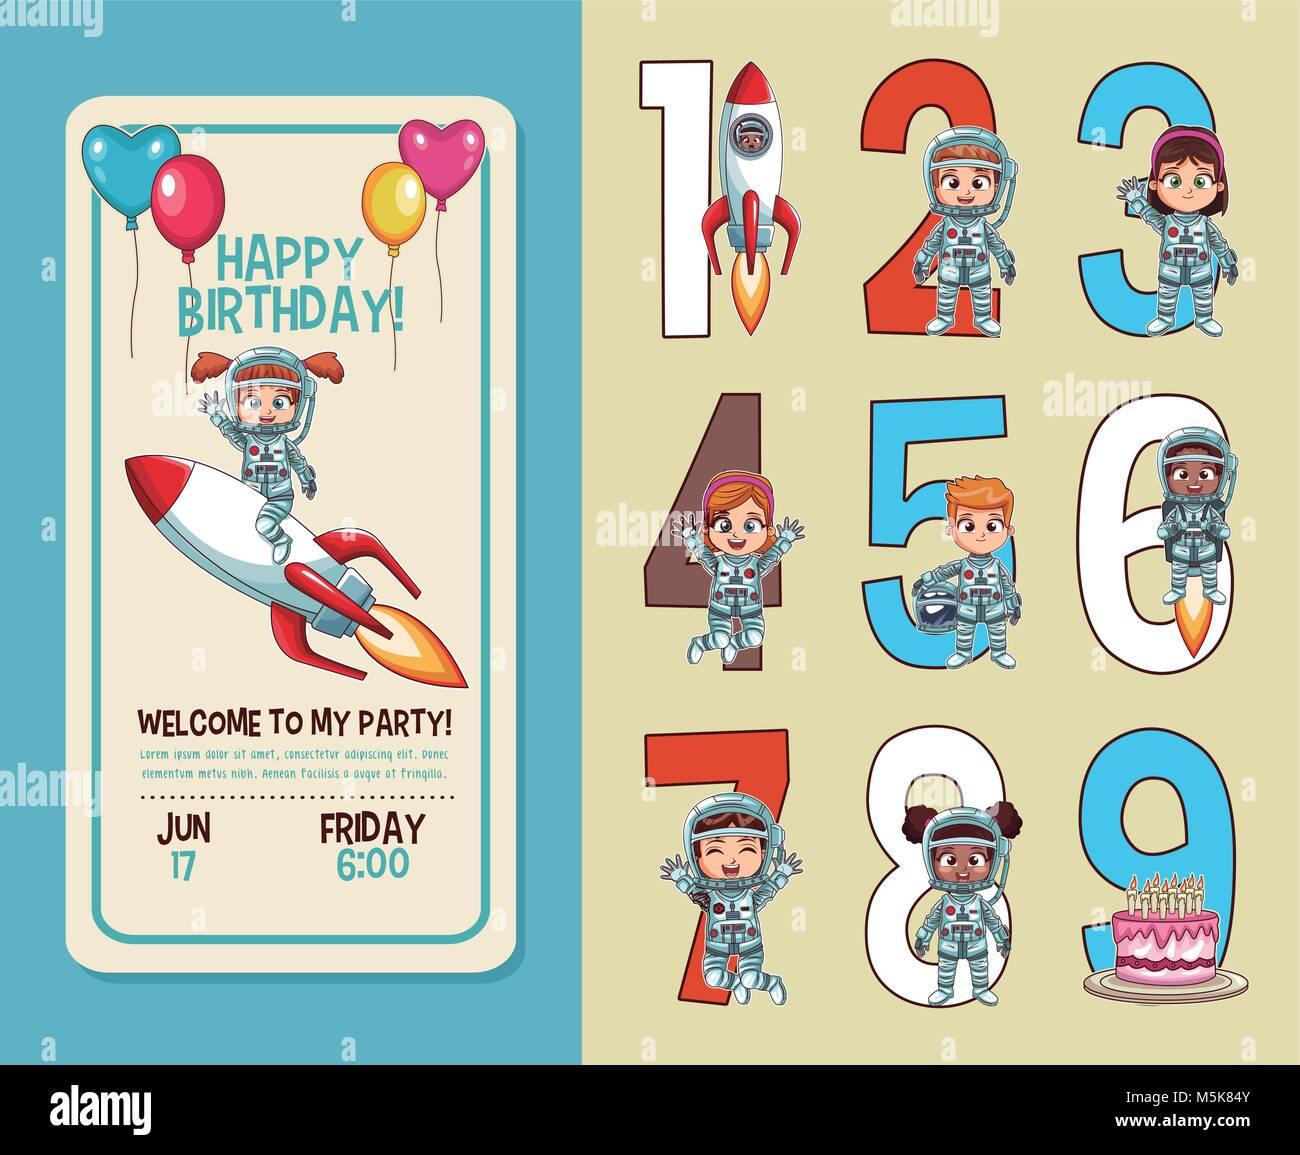 Kids Birthday Party Invitation Card Stock Vector Art